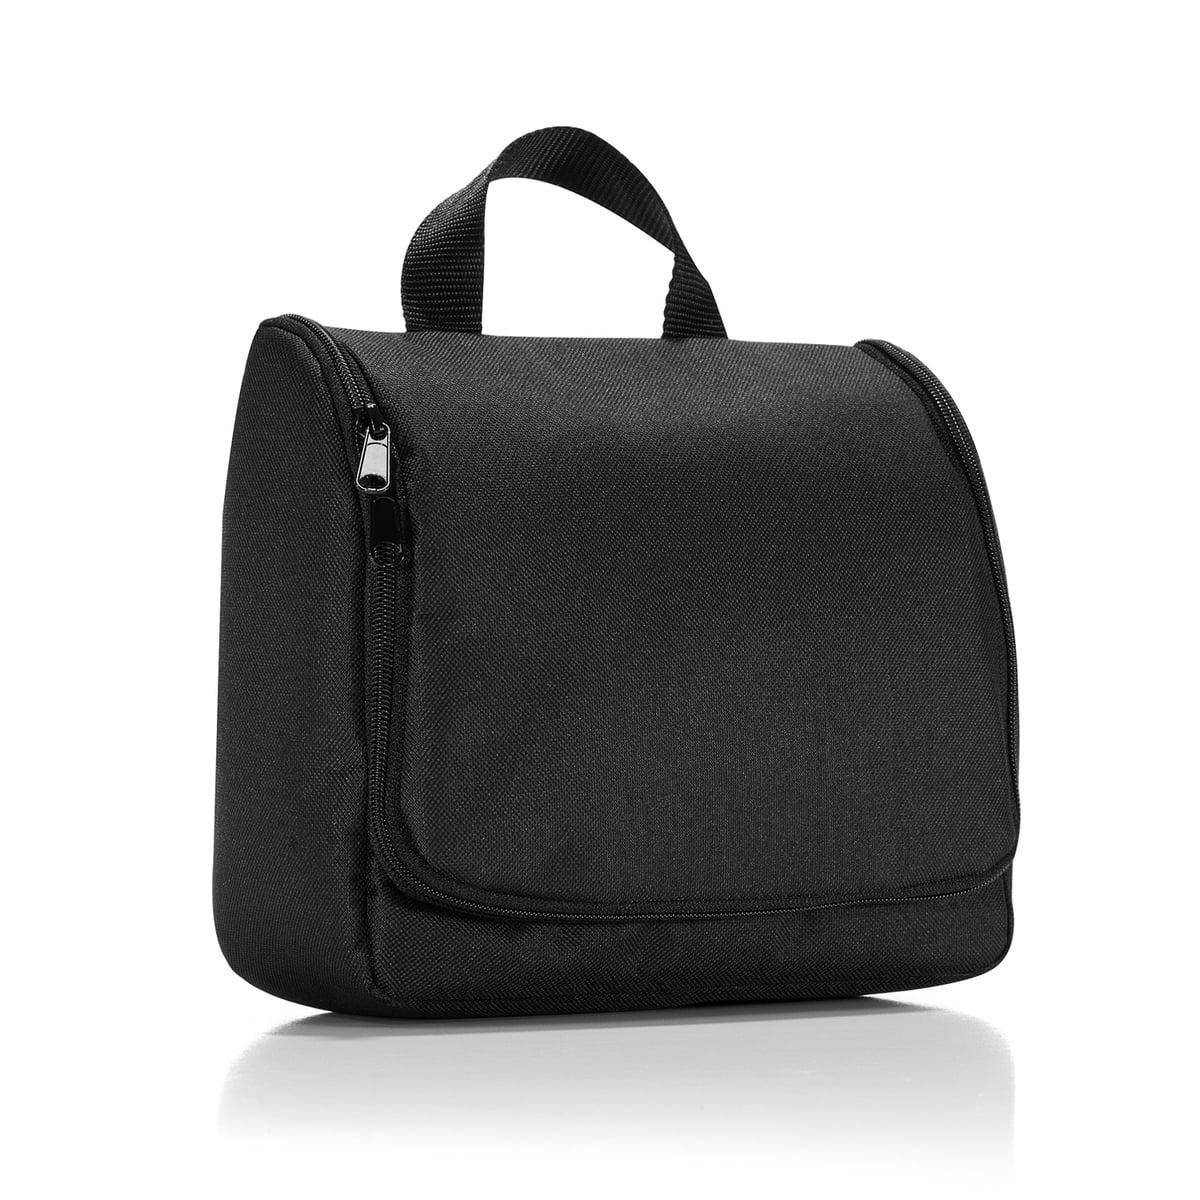 reisenthel - toiletbag, schwarz